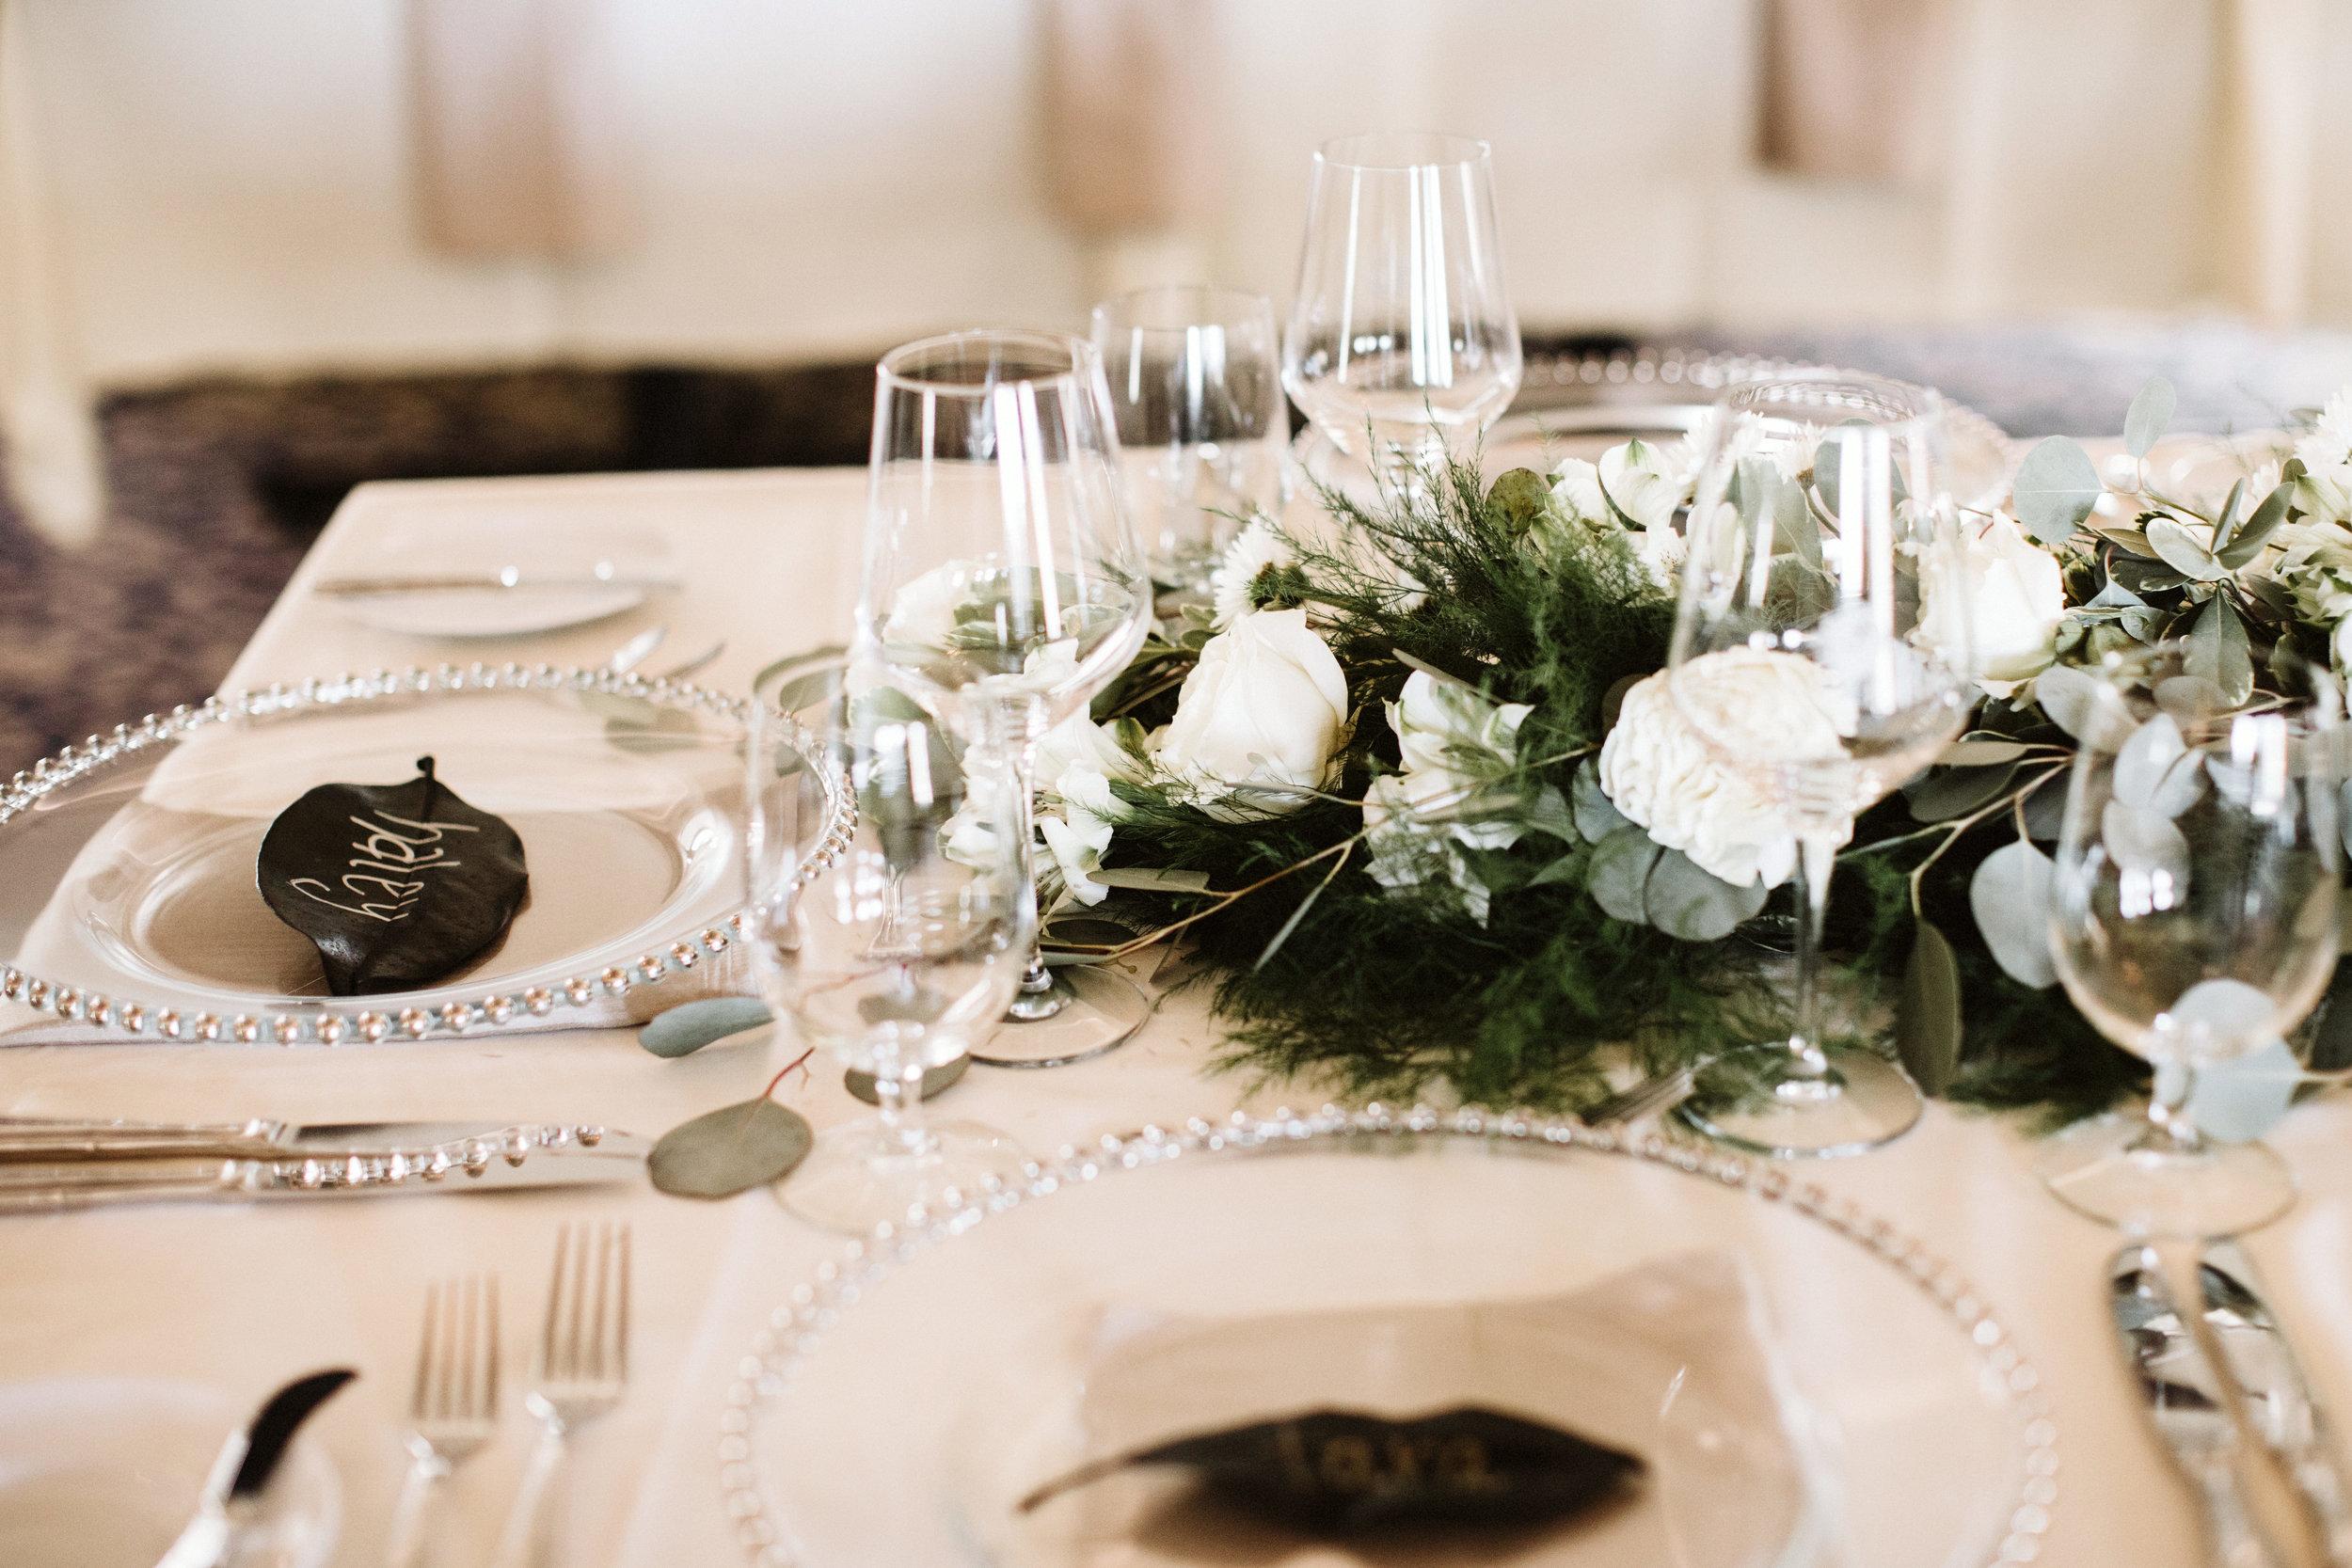 rachel-and-david-scott-wedding-83.jpg